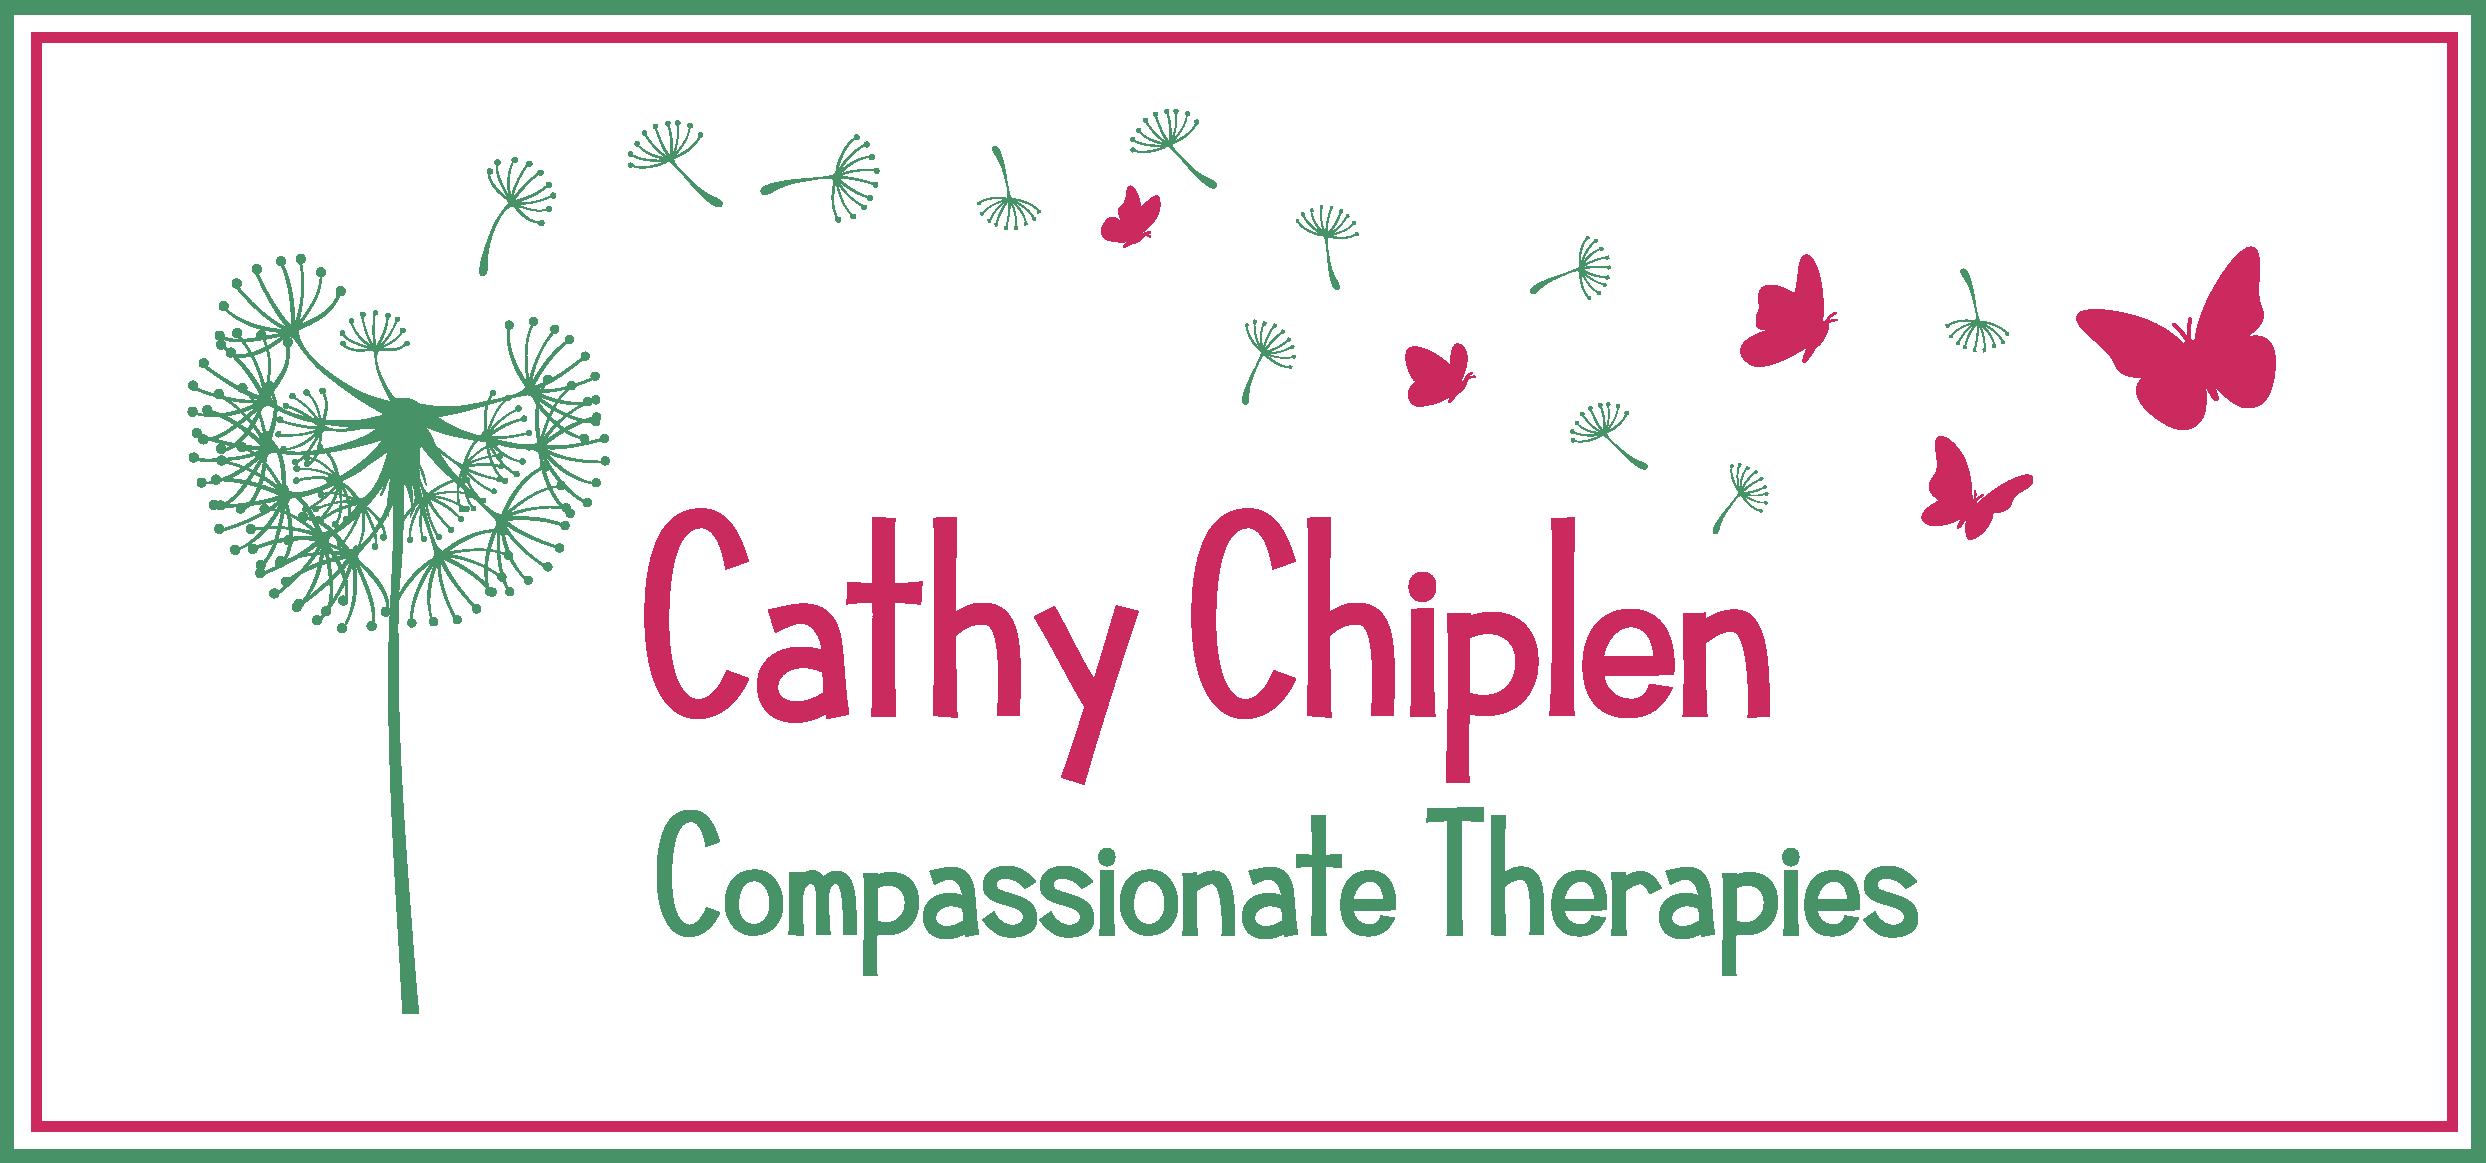 Cathy Chiplen